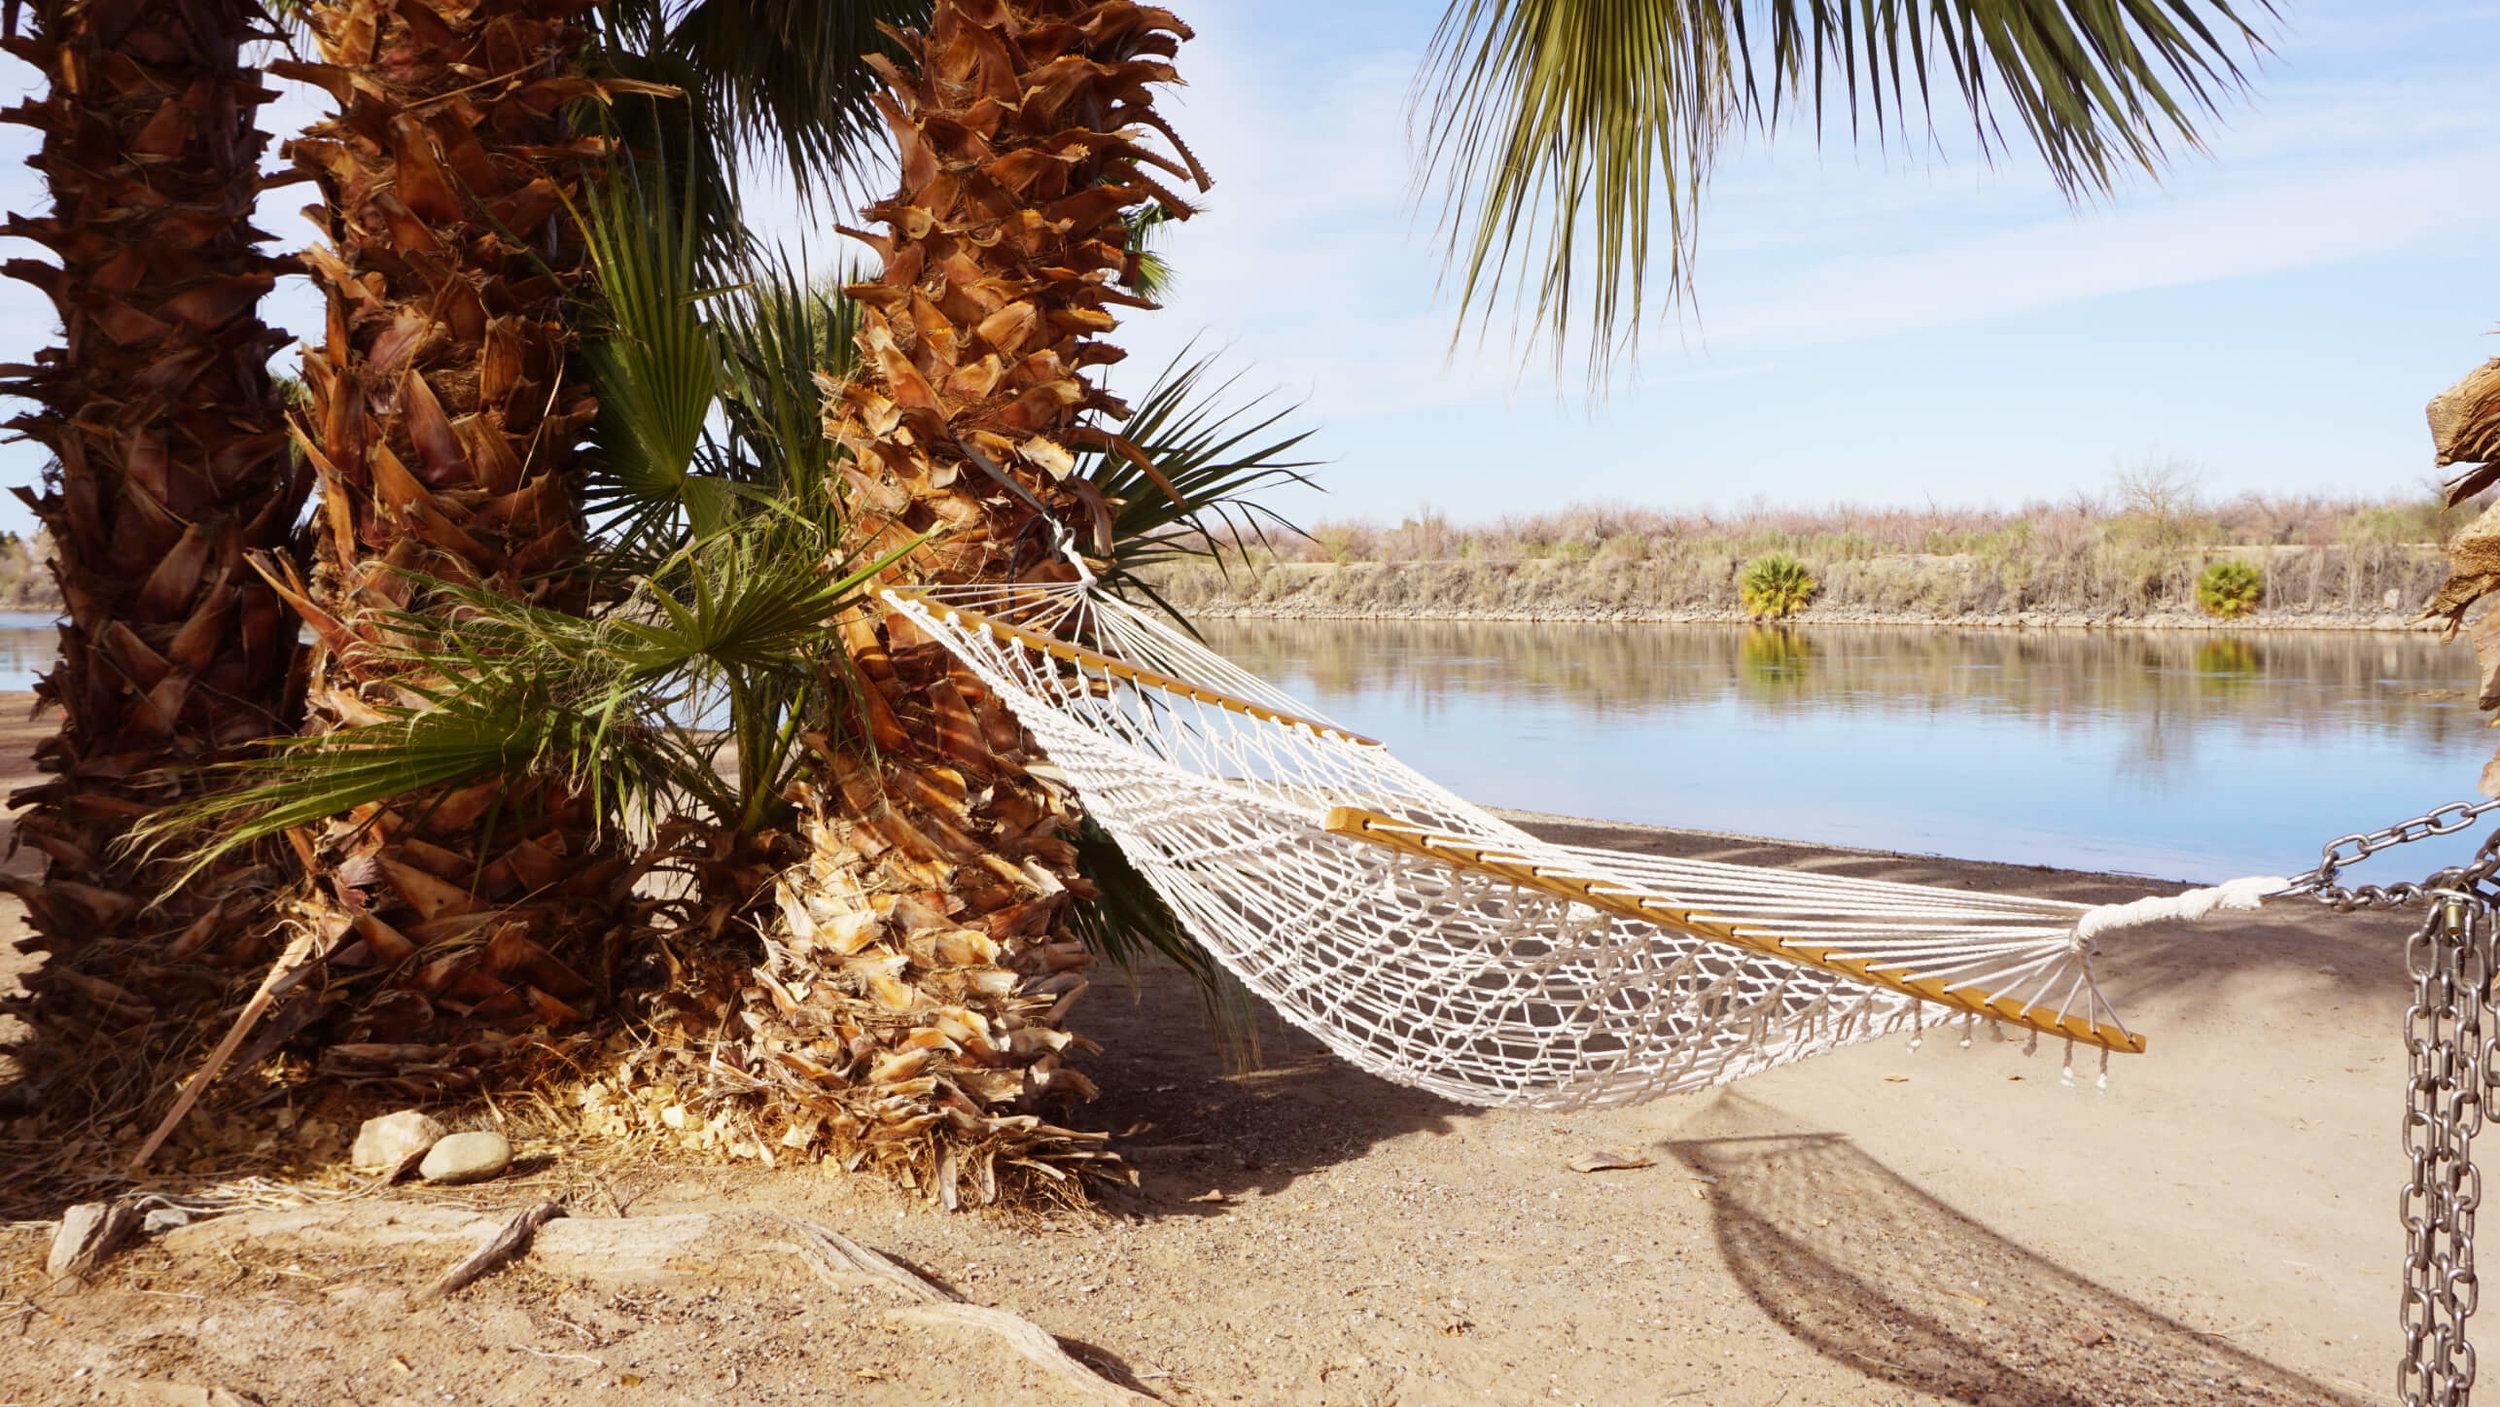 Lay in the hammock on the beach